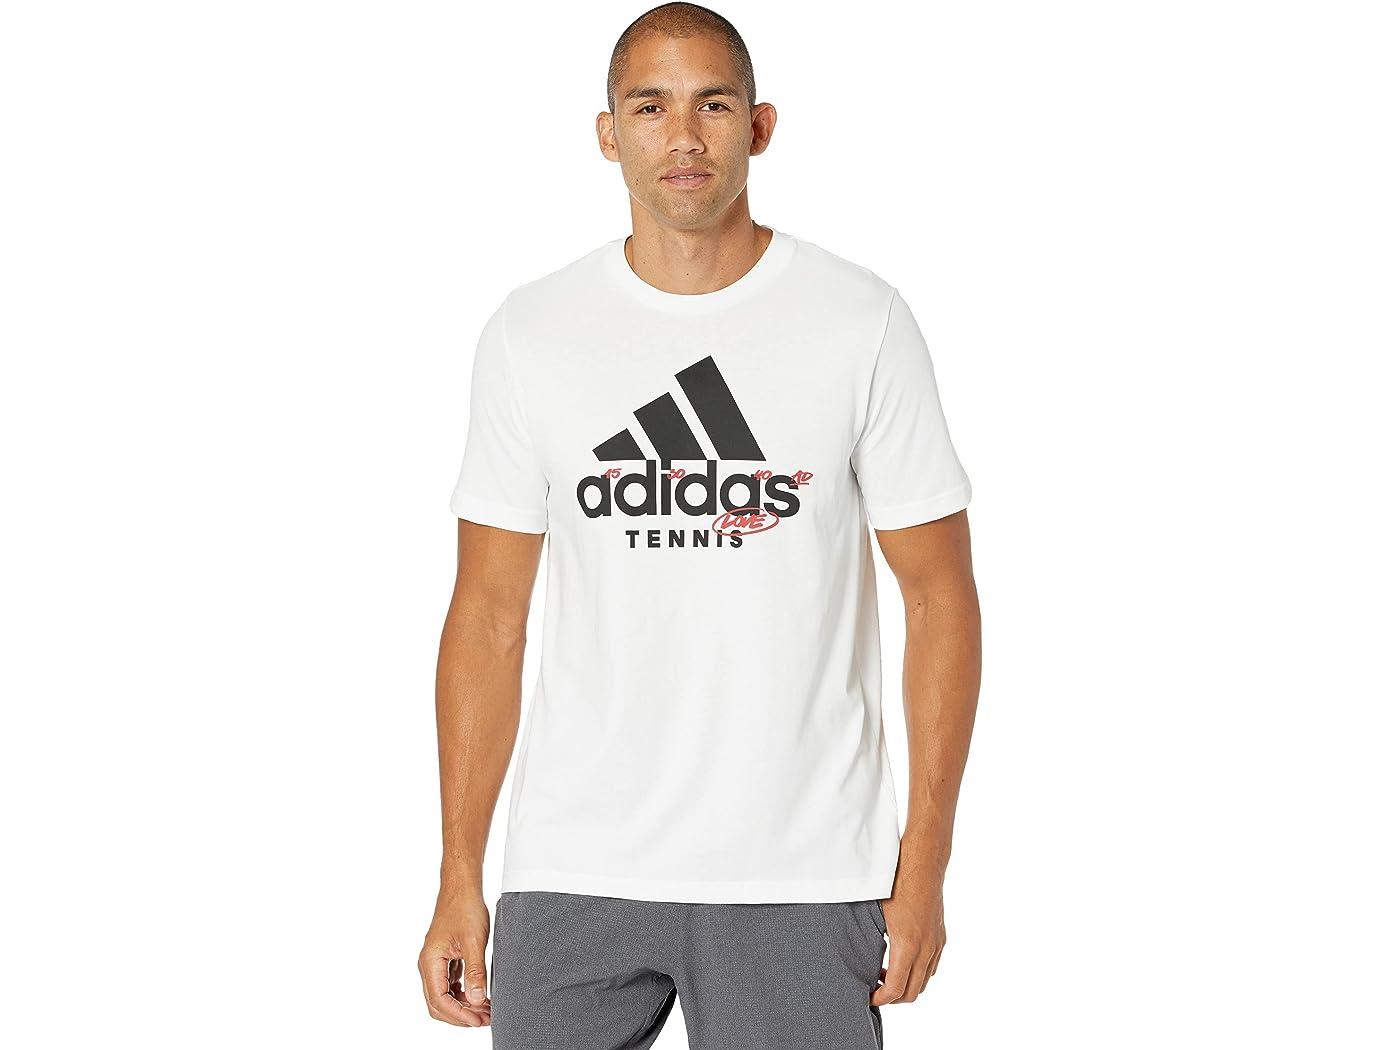 Adidas Tennis Graphic Logo Tee